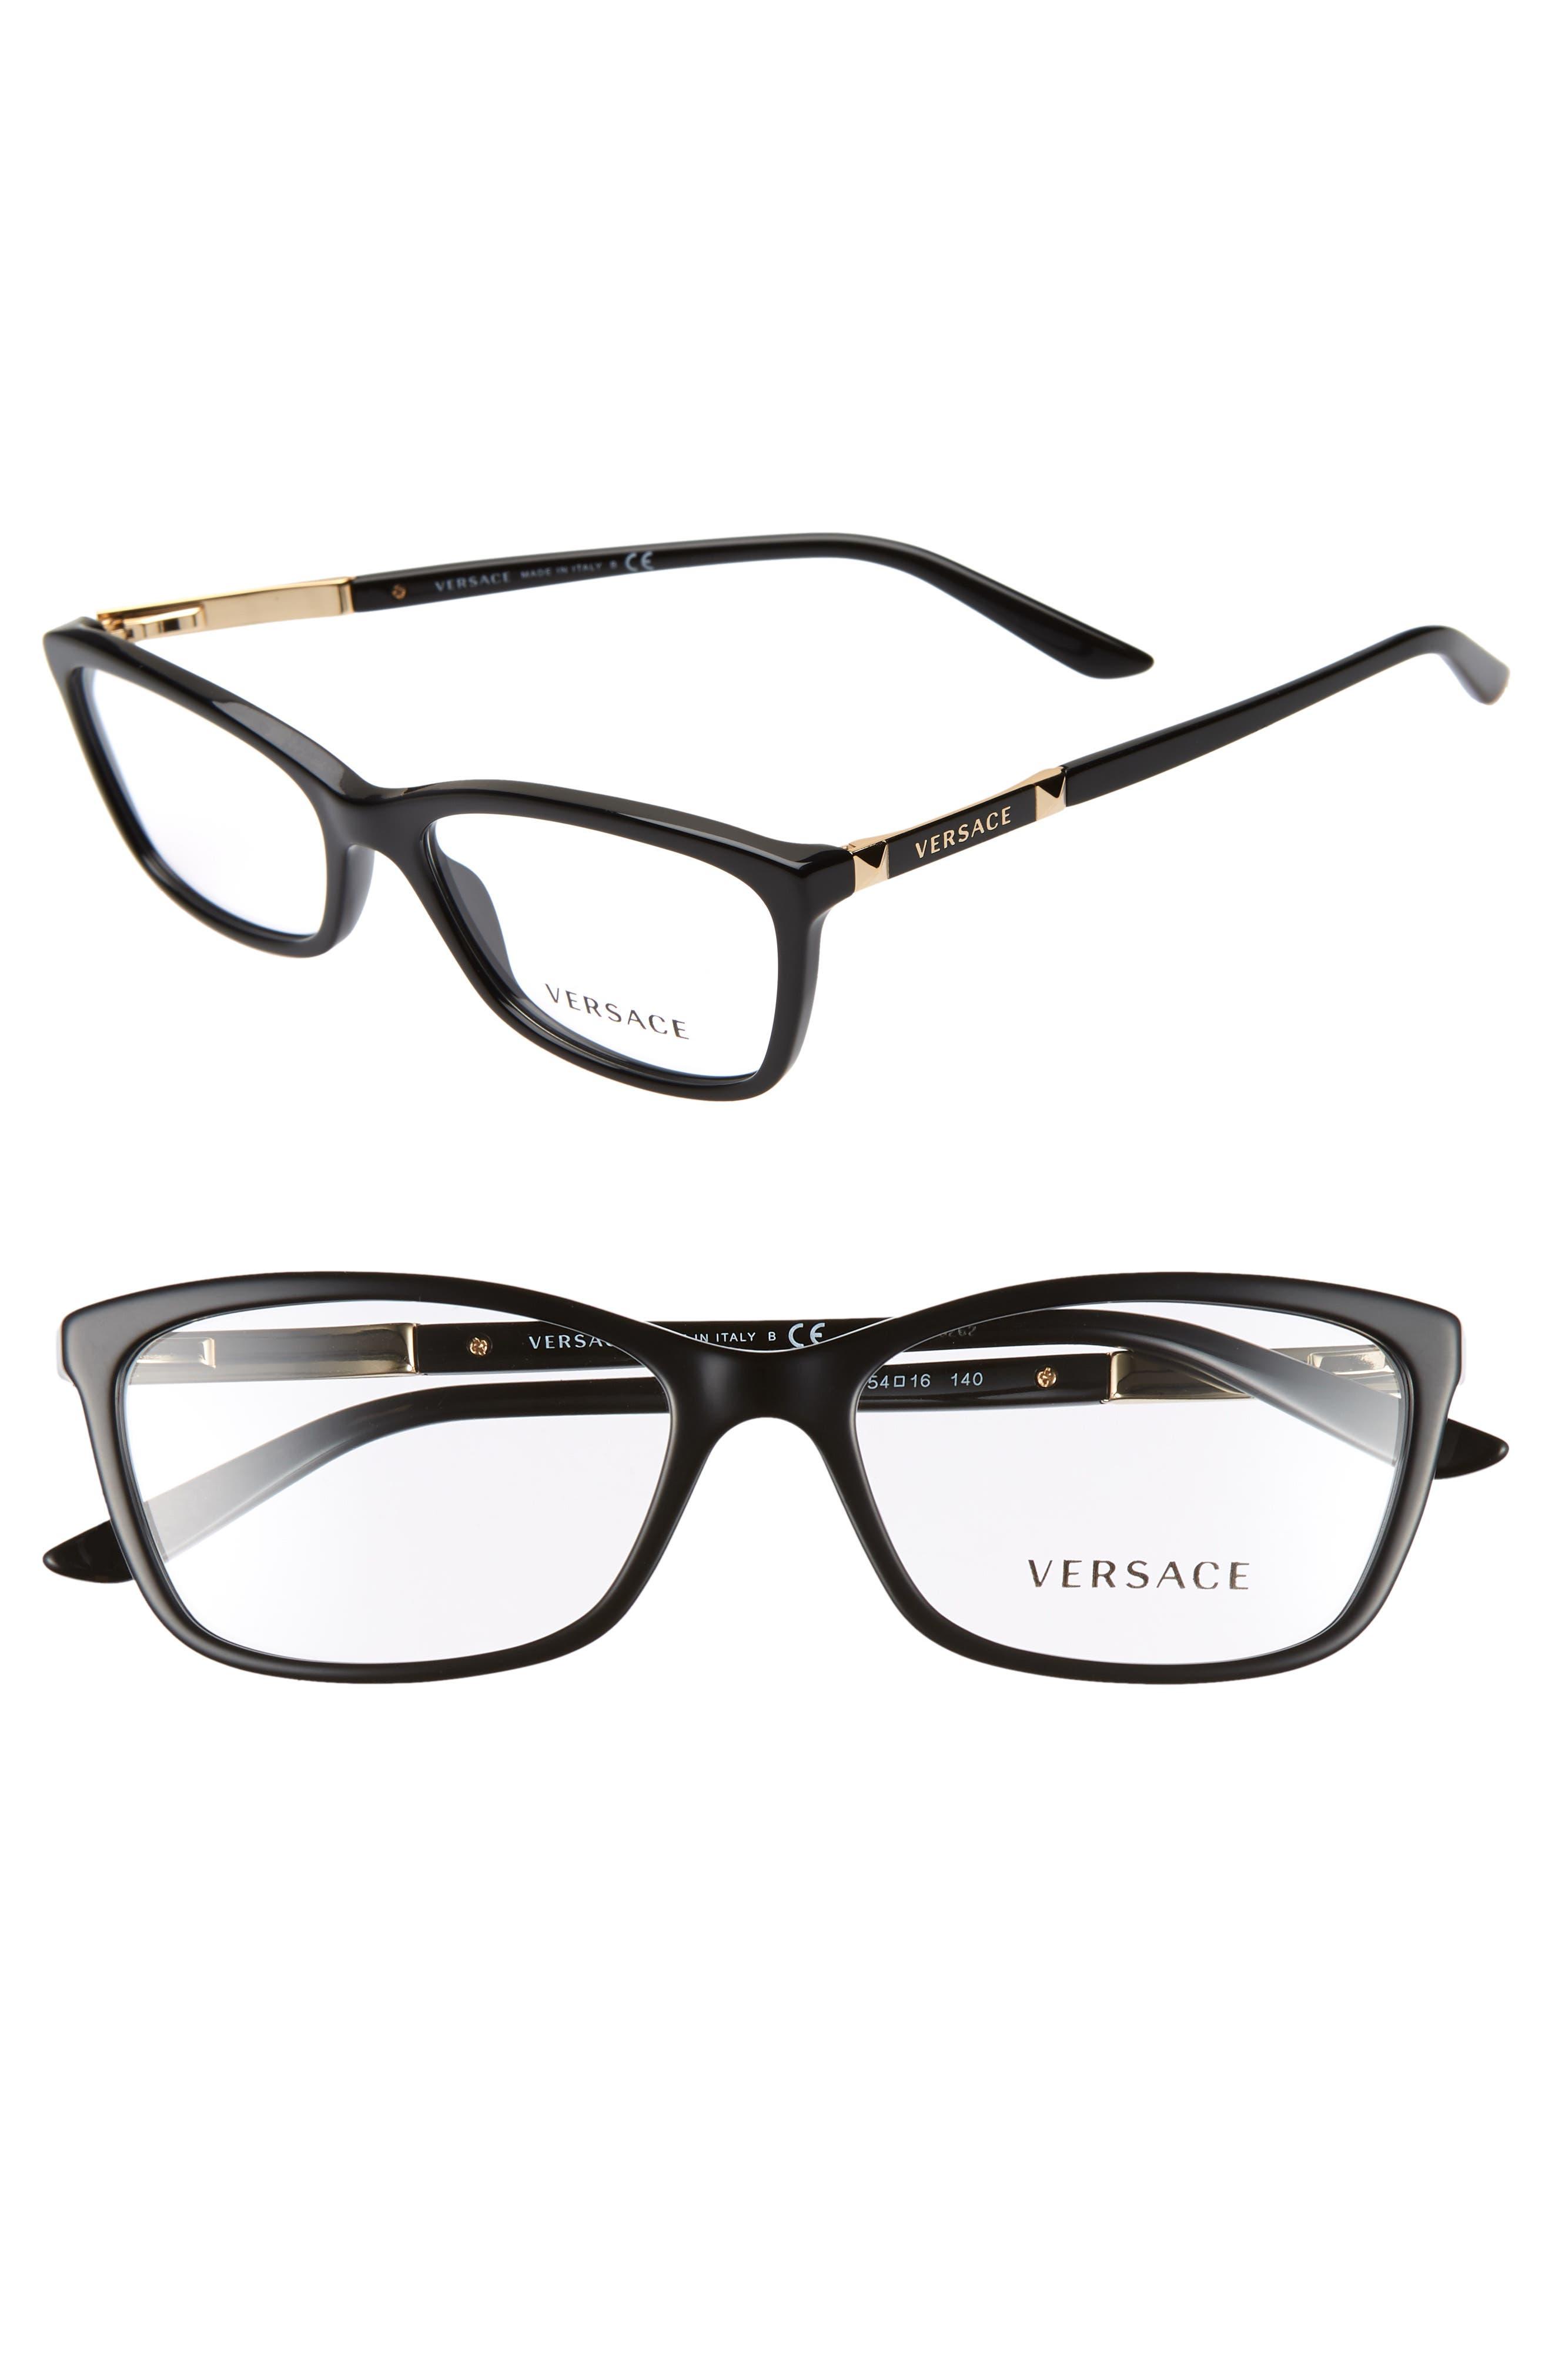 VERSACE 54mm Optical Glasses, Main, color, BLACK